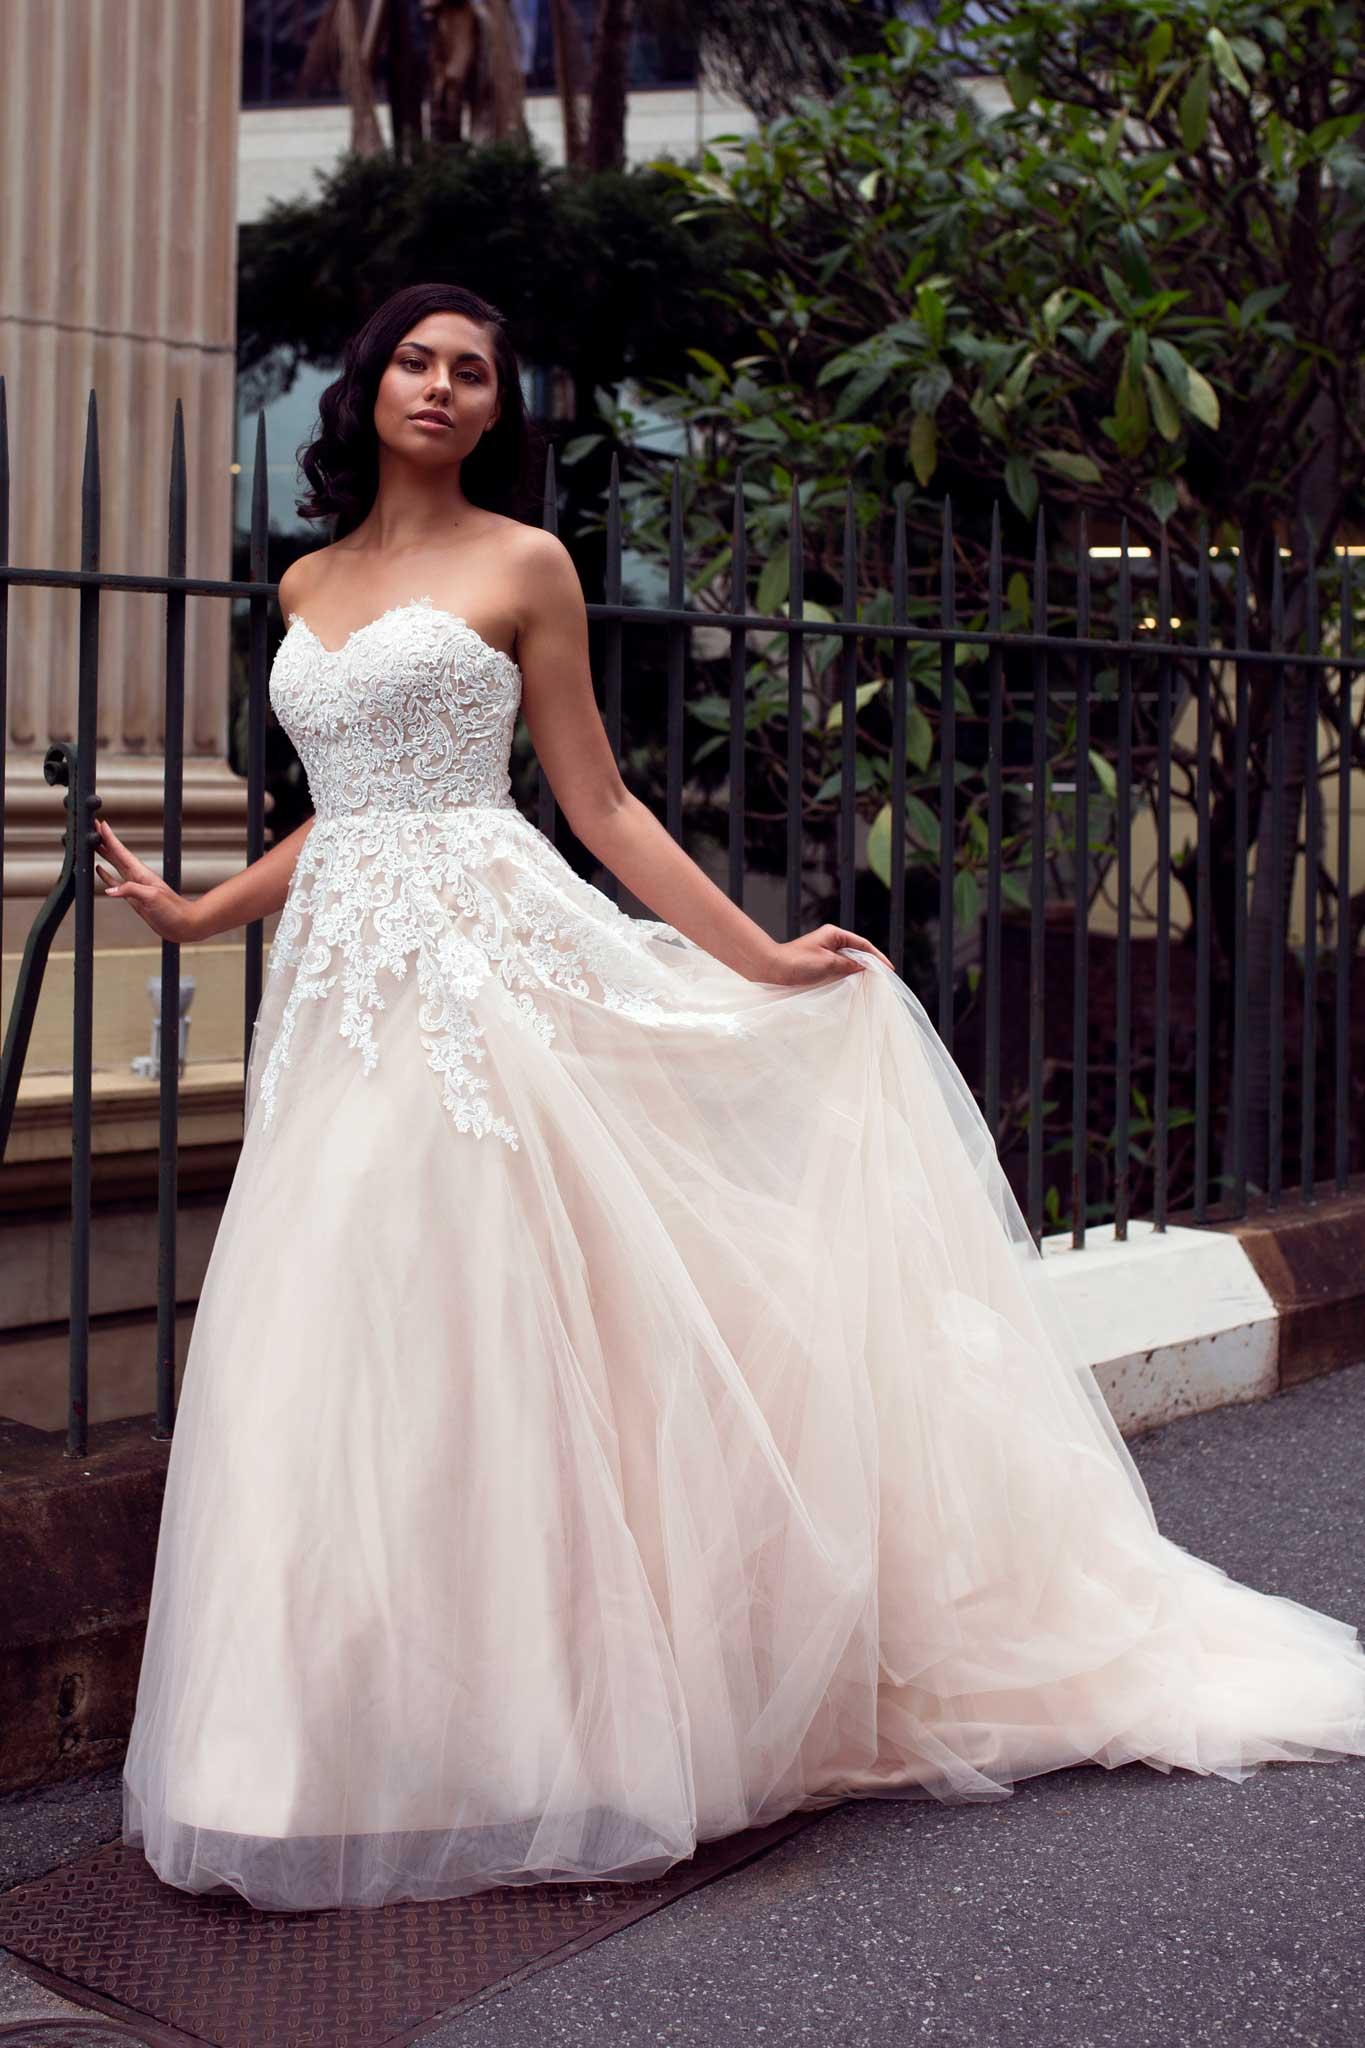 384d5b3ed فساتين زفاف 2016 للعروس المتألقة الرومانسية